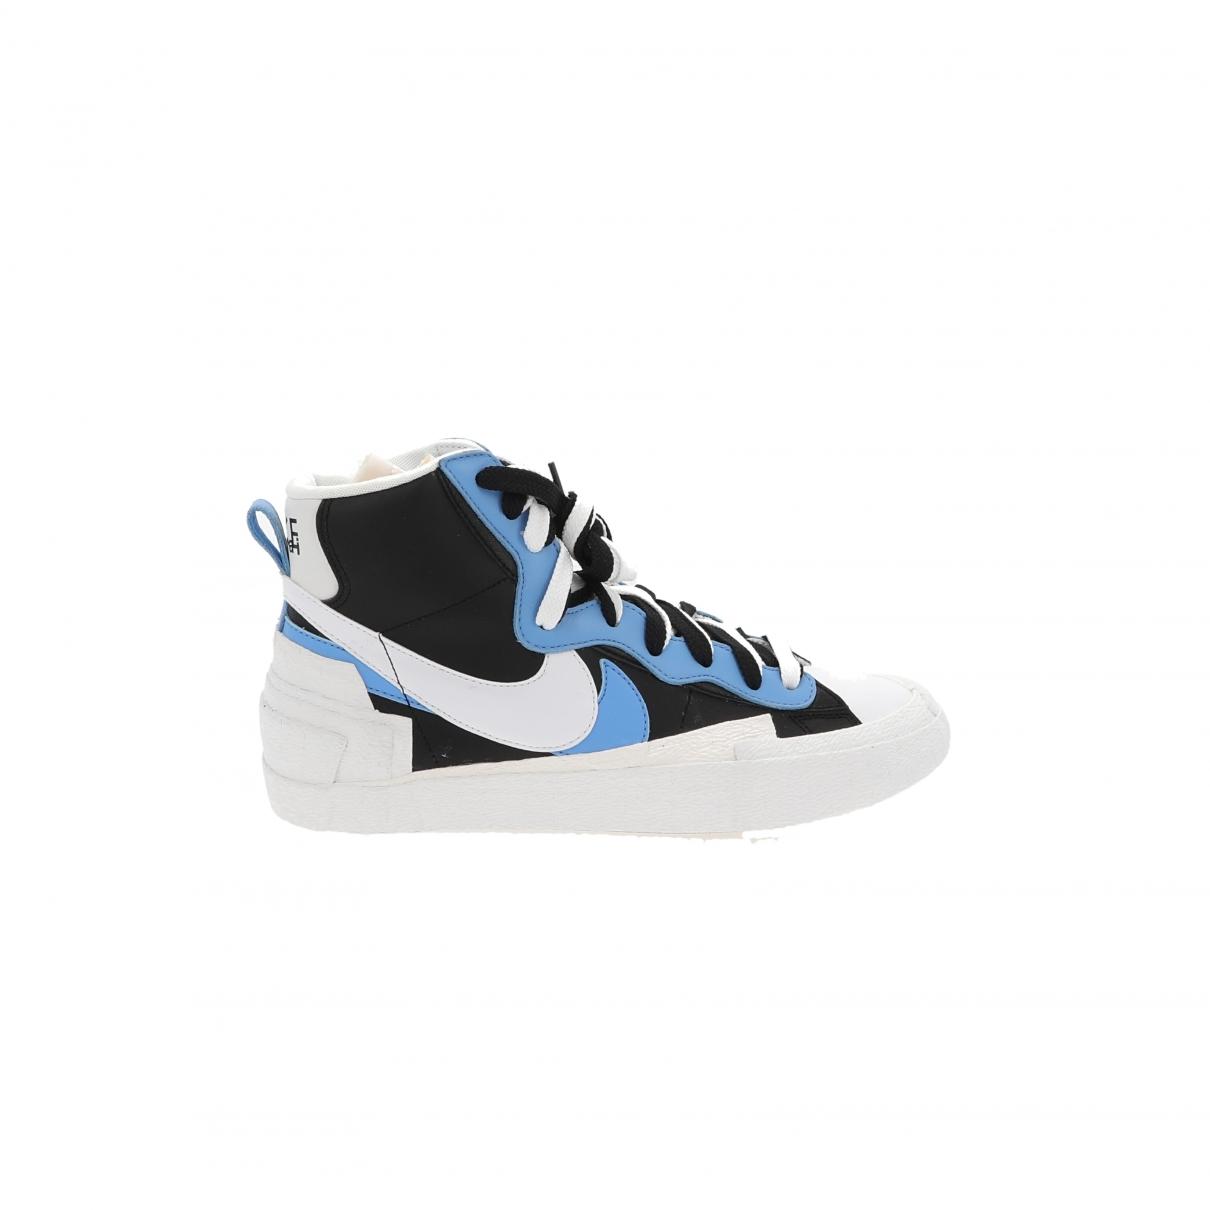 Nike X Sacai Blazer Mid Sneakers in  Blau Leder